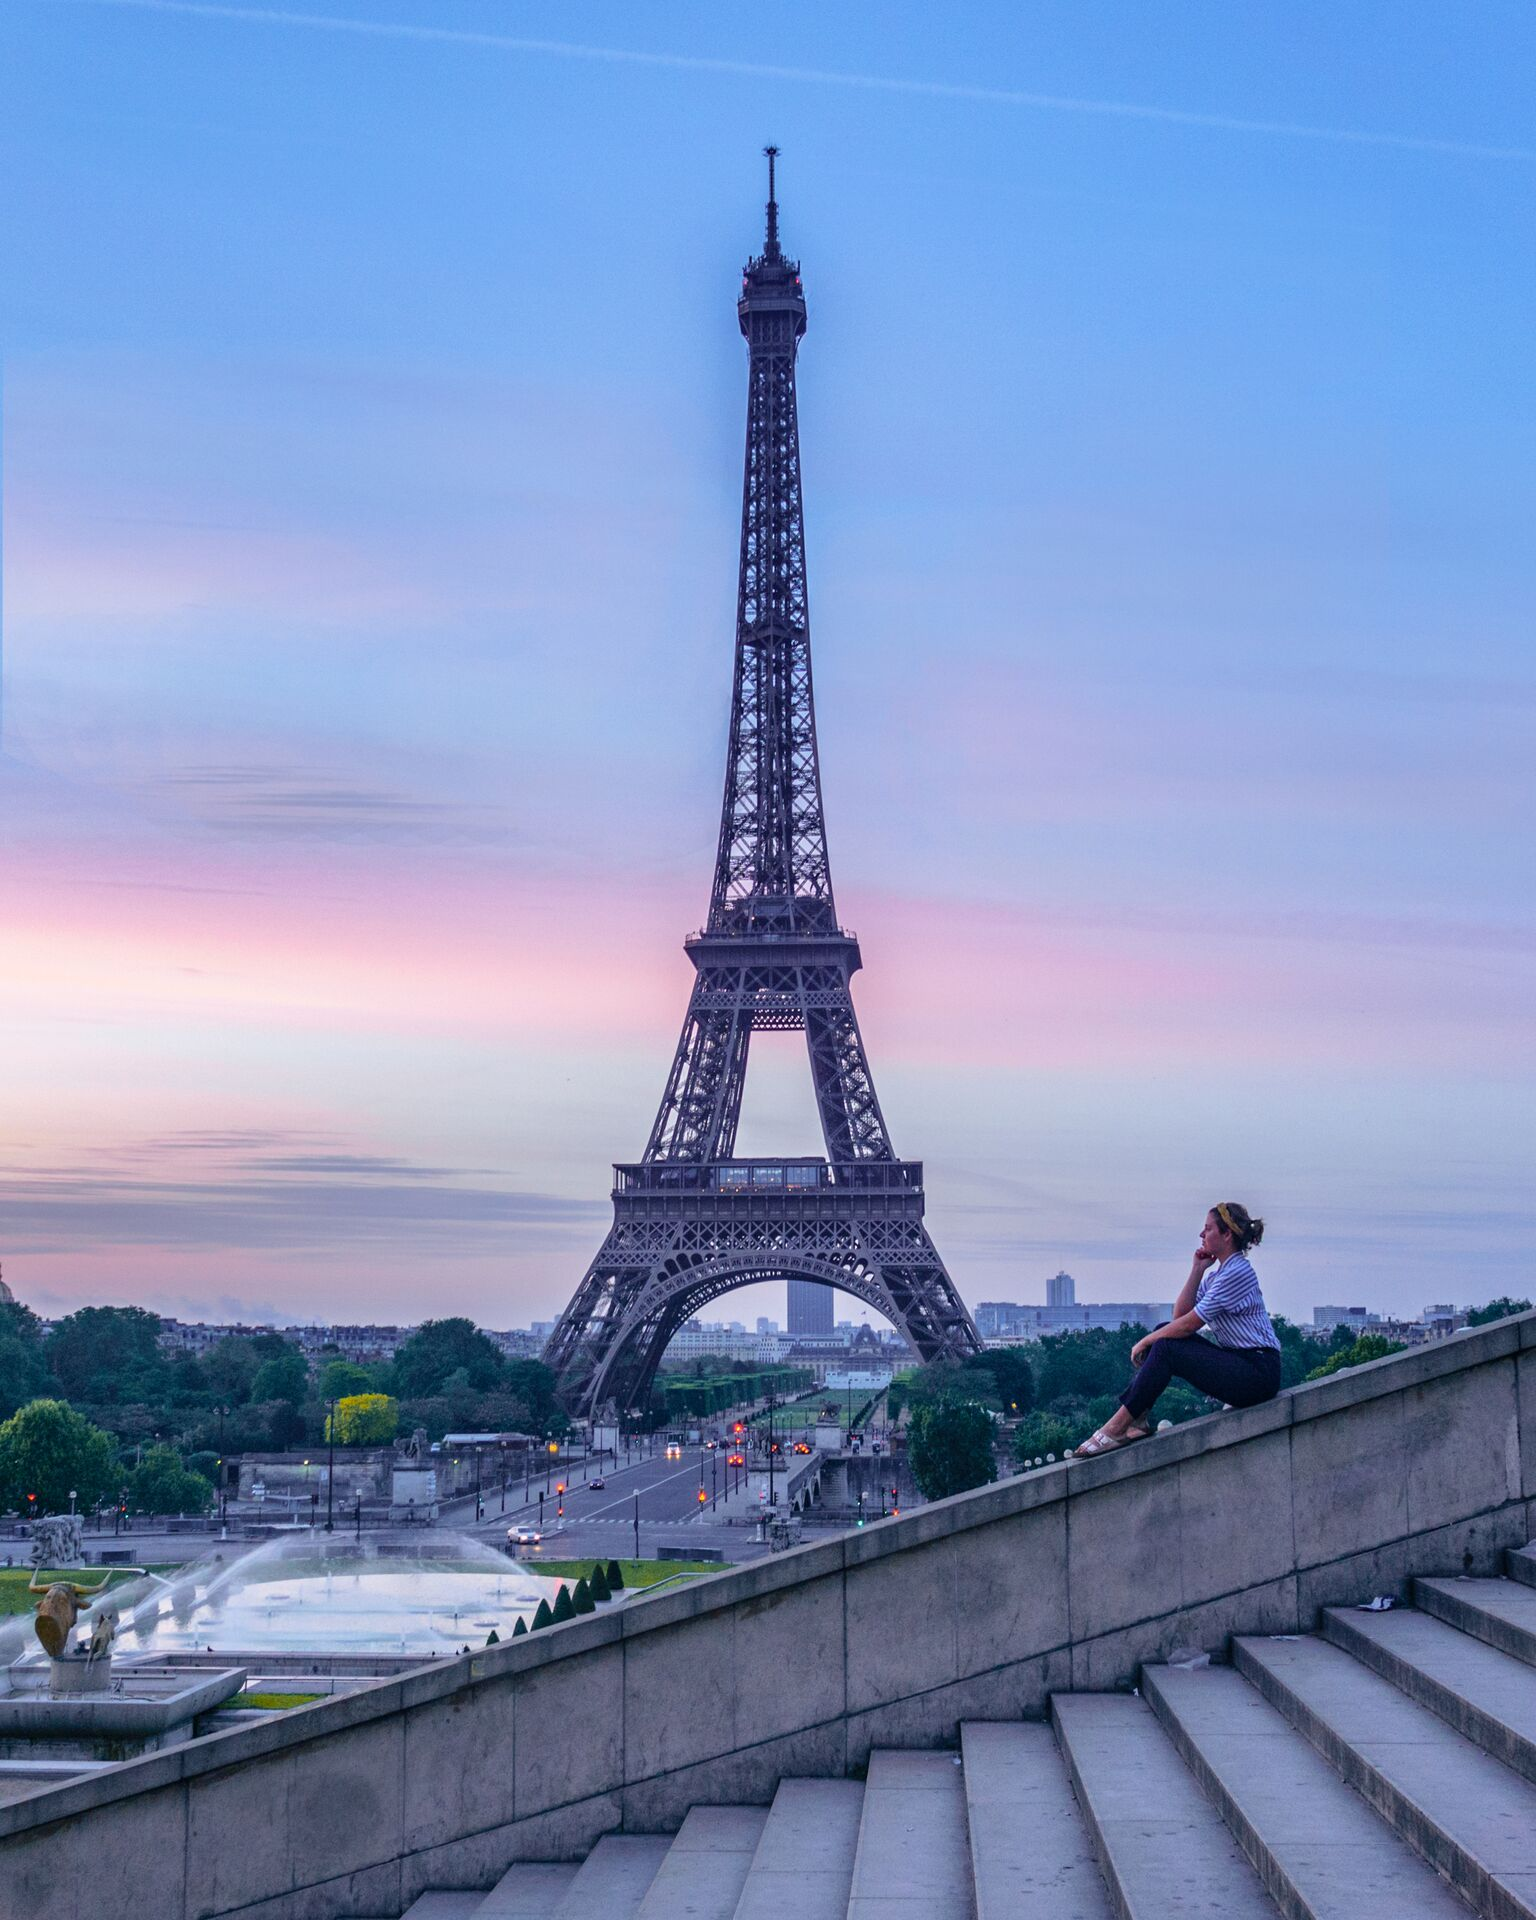 Carmen Huter Paris 1 819x1024 - Carmen Huter Shares How to Plan Your Next Trip Like a Pro